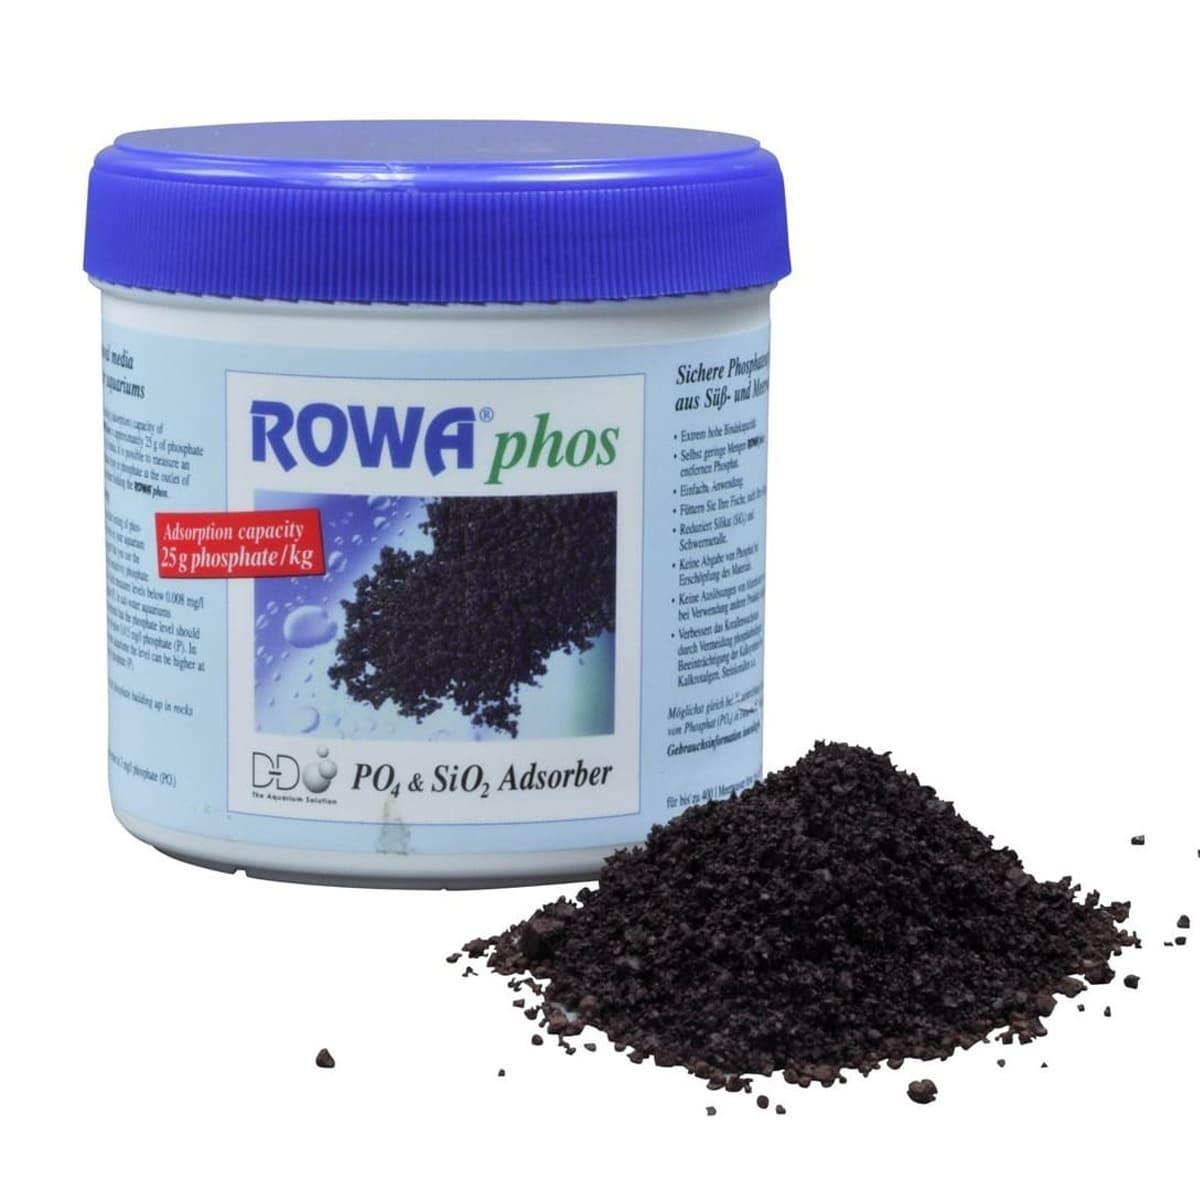 Removedor de Fosfato e Silicato ROWA PHOS 500G